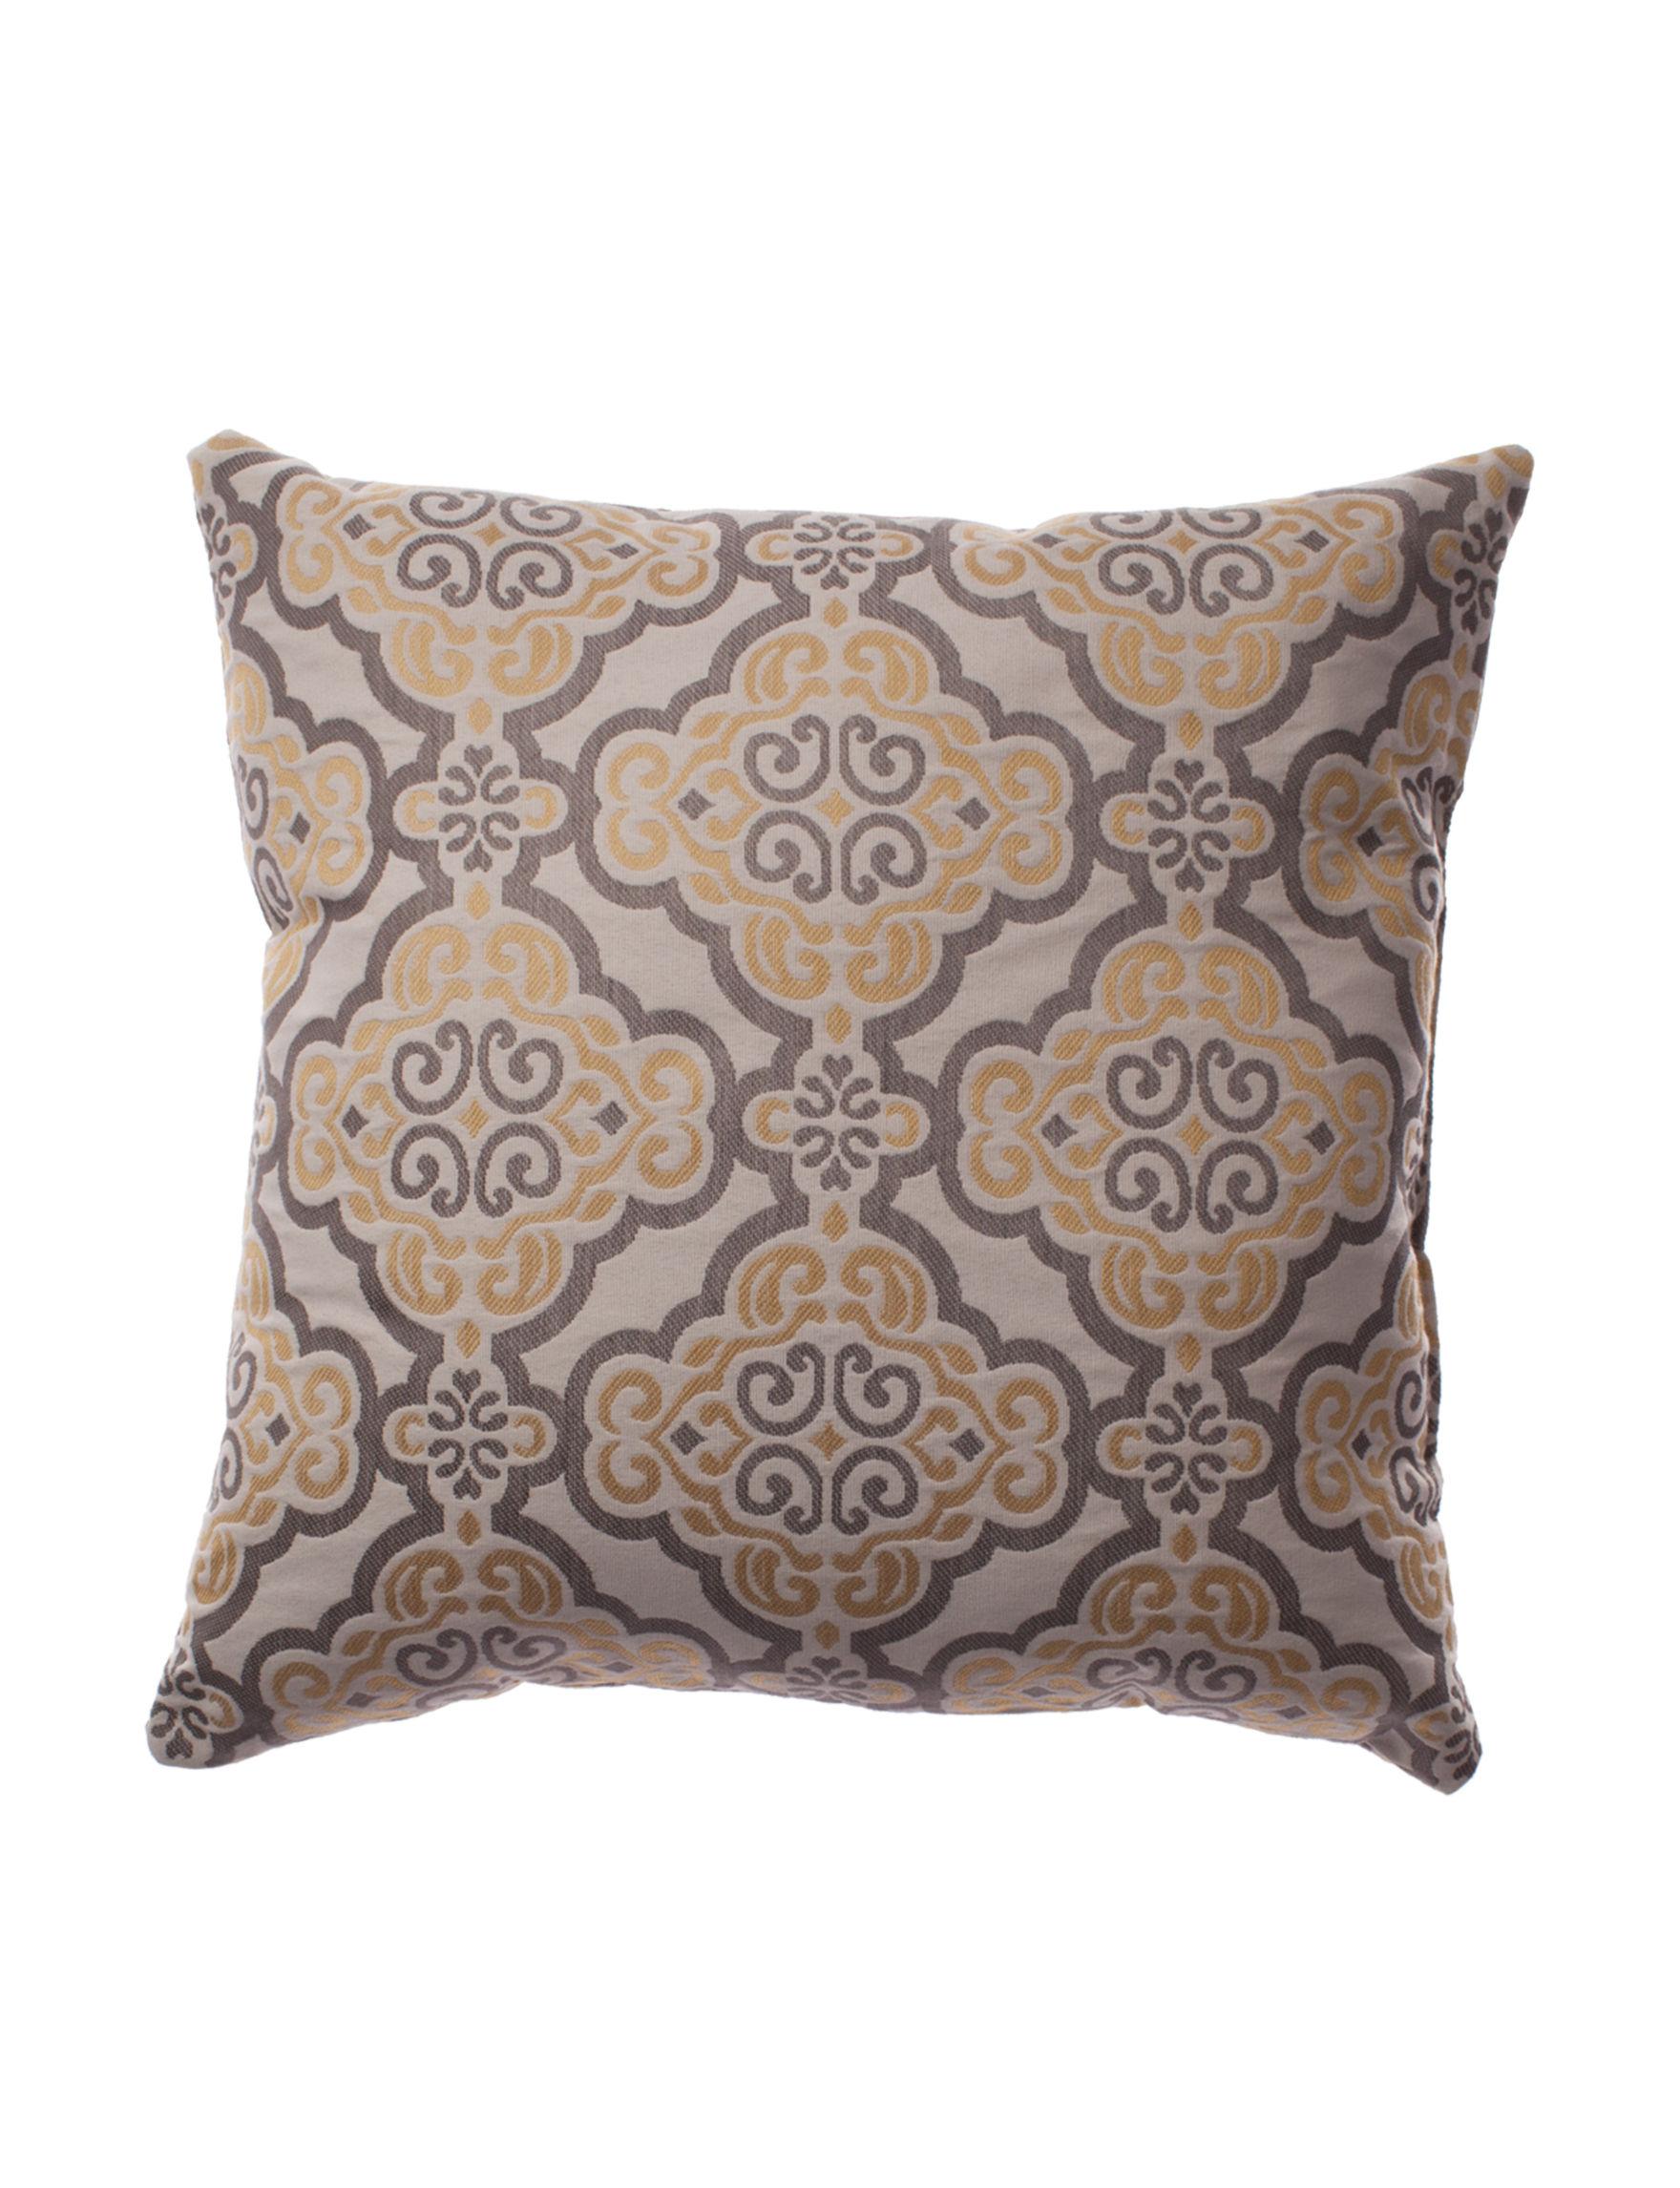 Home Fashions International Yellow / Multi Decorative Pillows